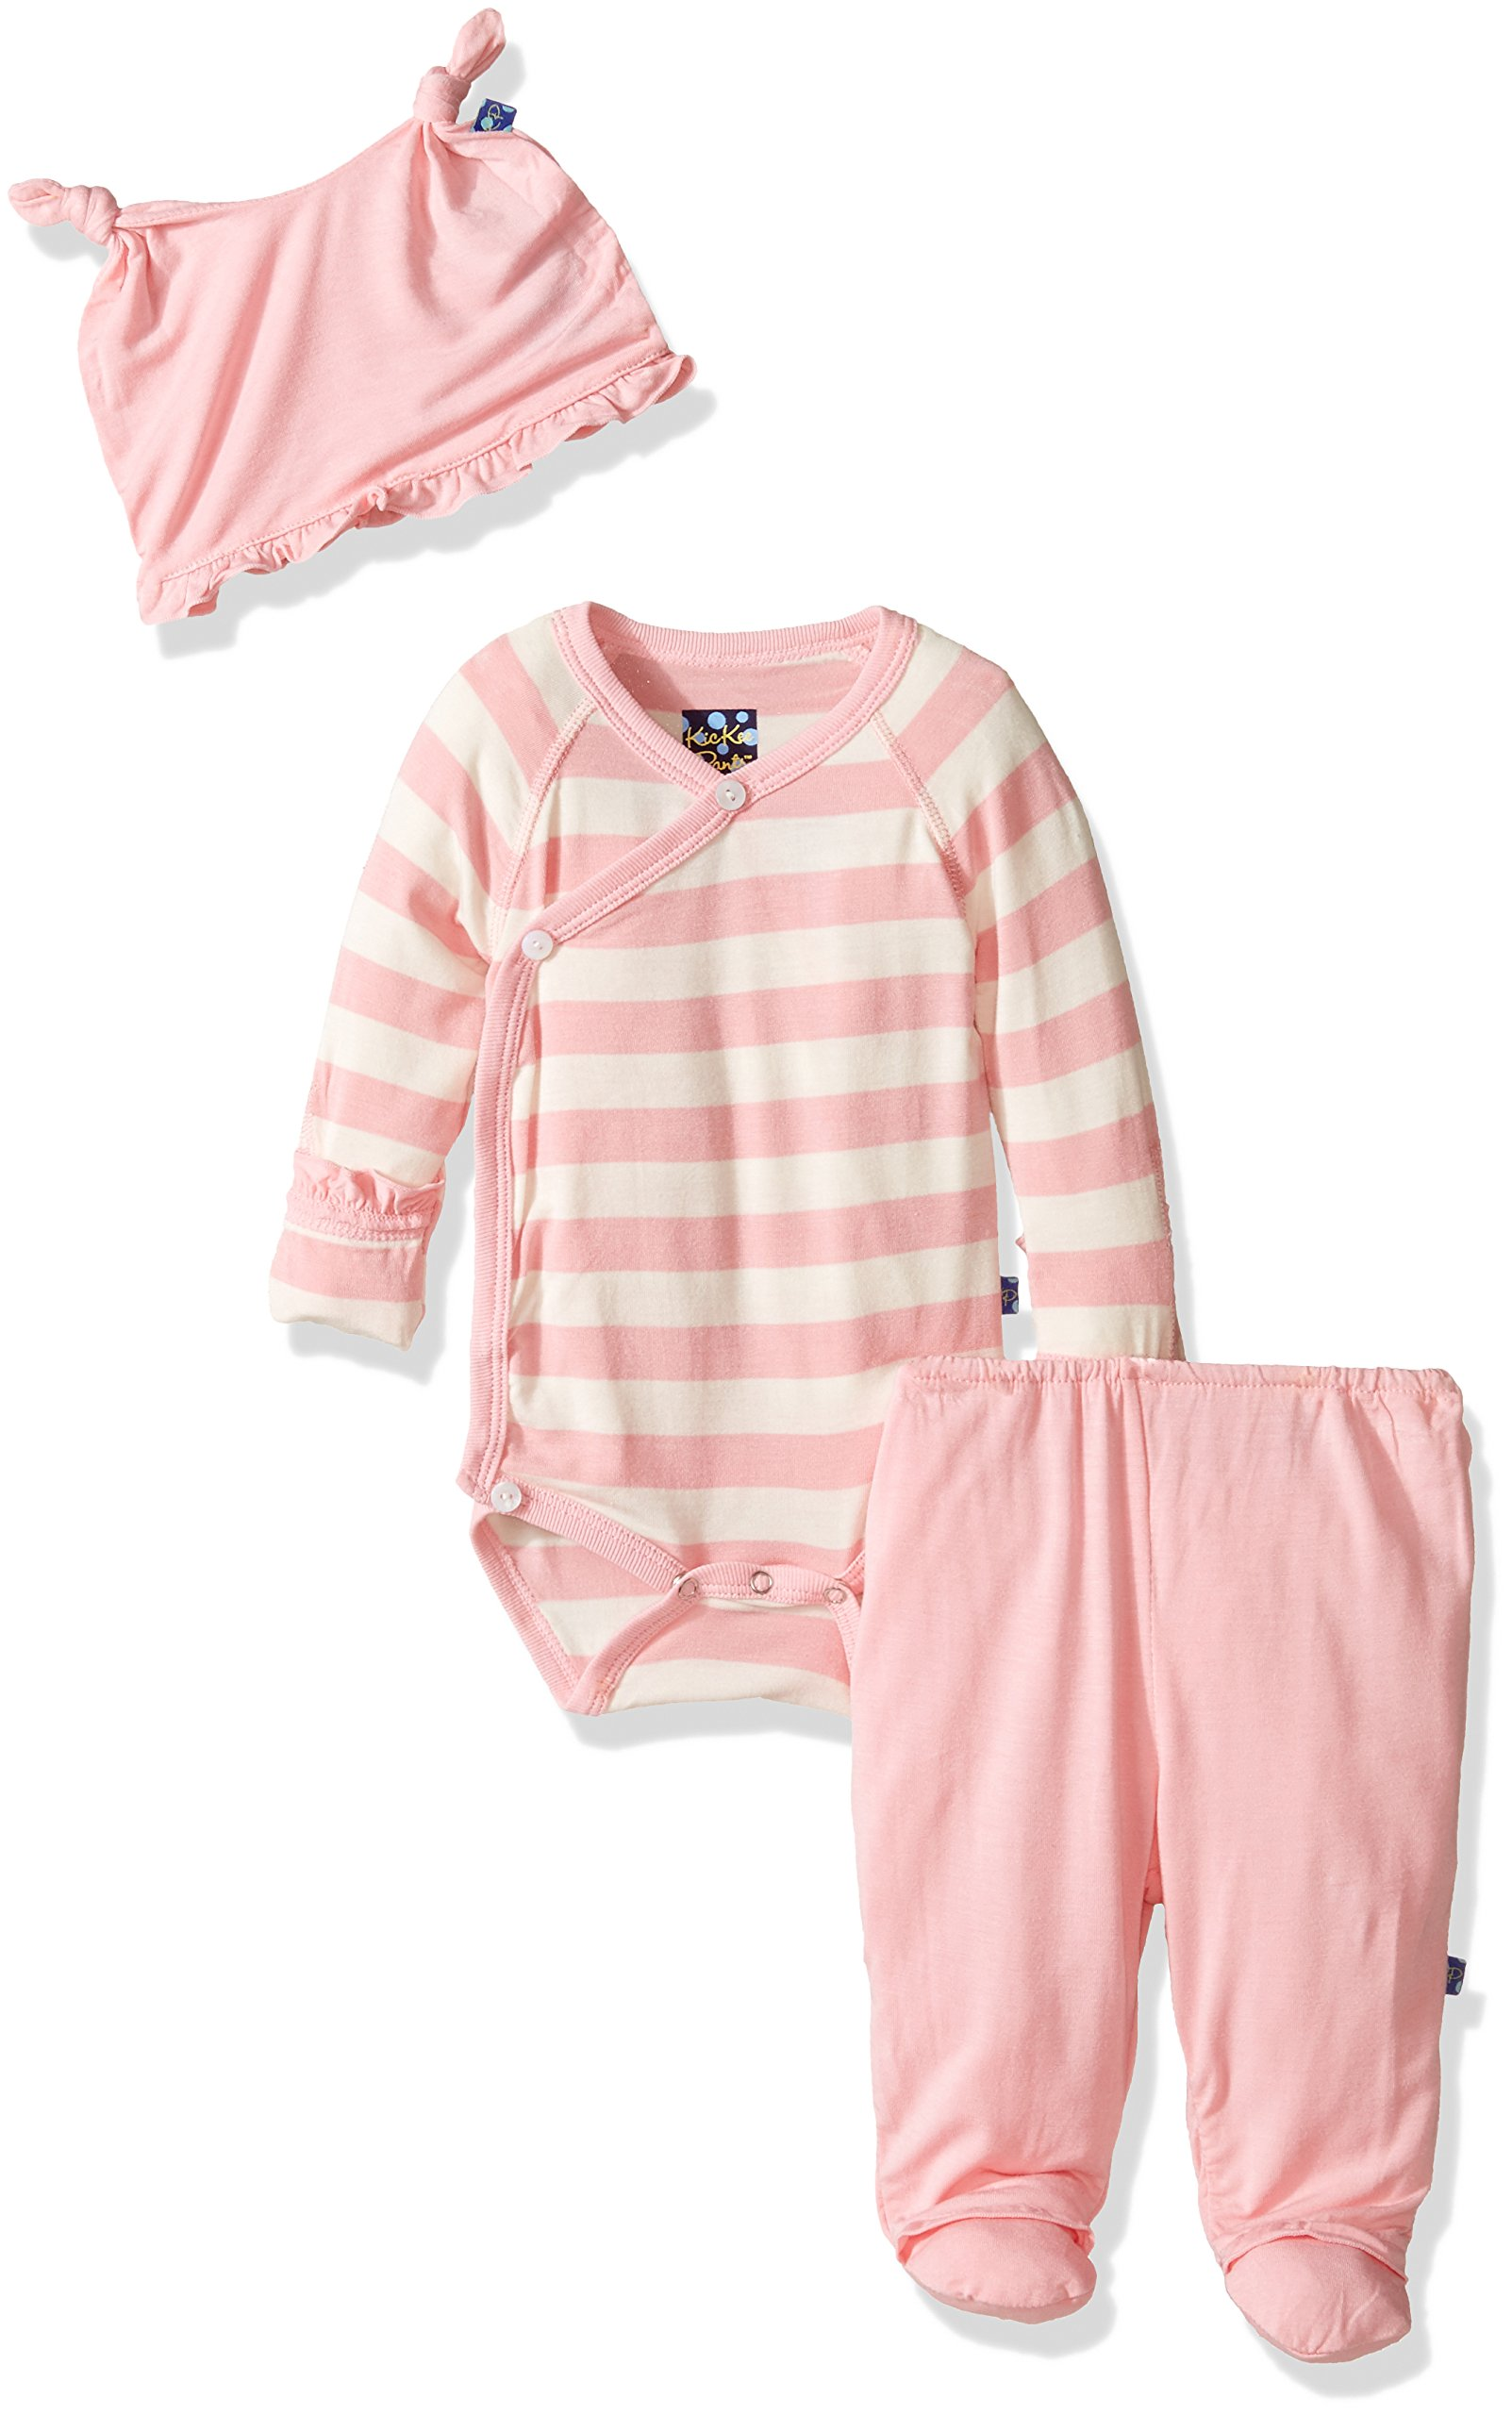 KicKee Pants Essentials Ruffle Kimono Set, Lotus Stripe, Newborn by Kickee Pants